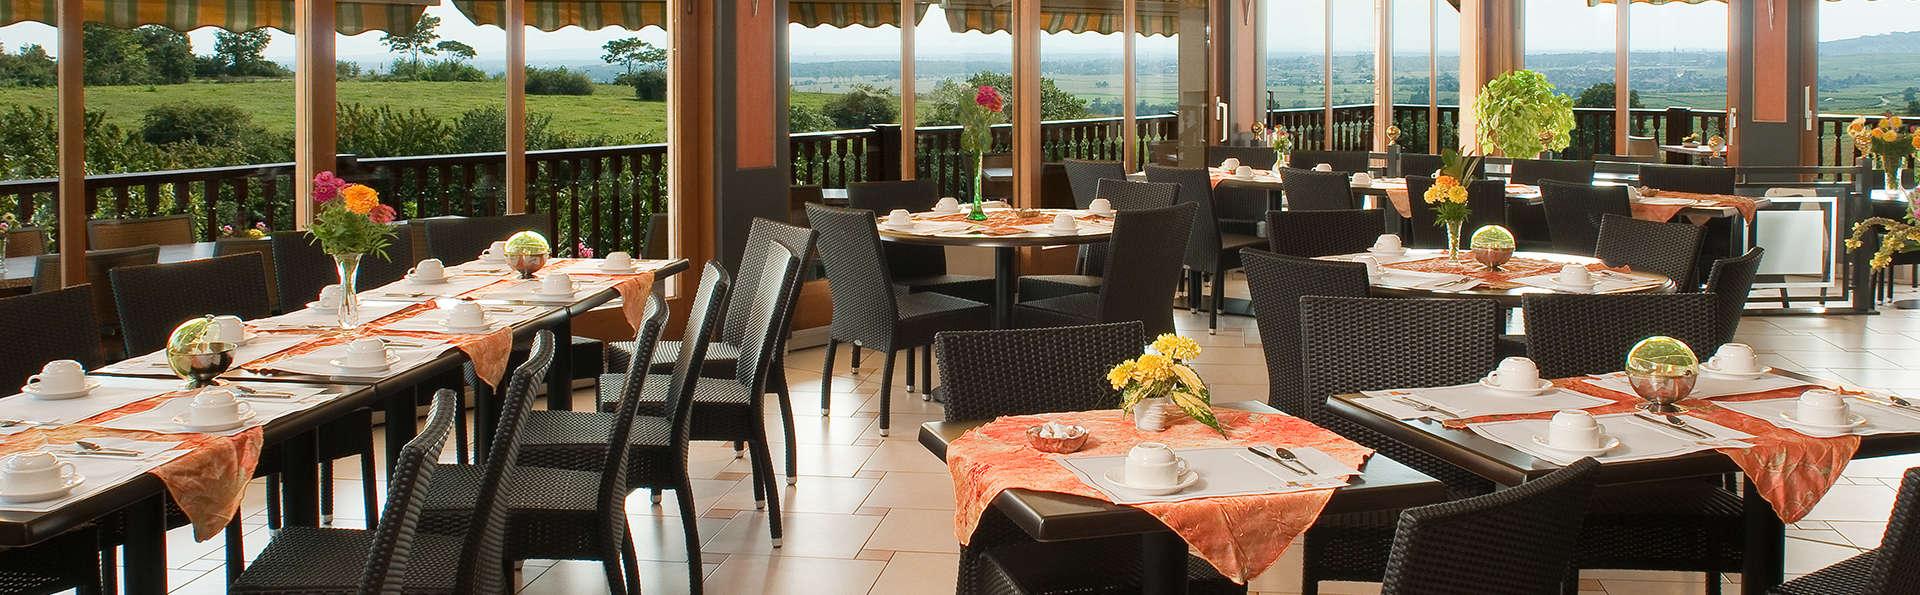 Offre spéciale : week-end avec dîner alsacien